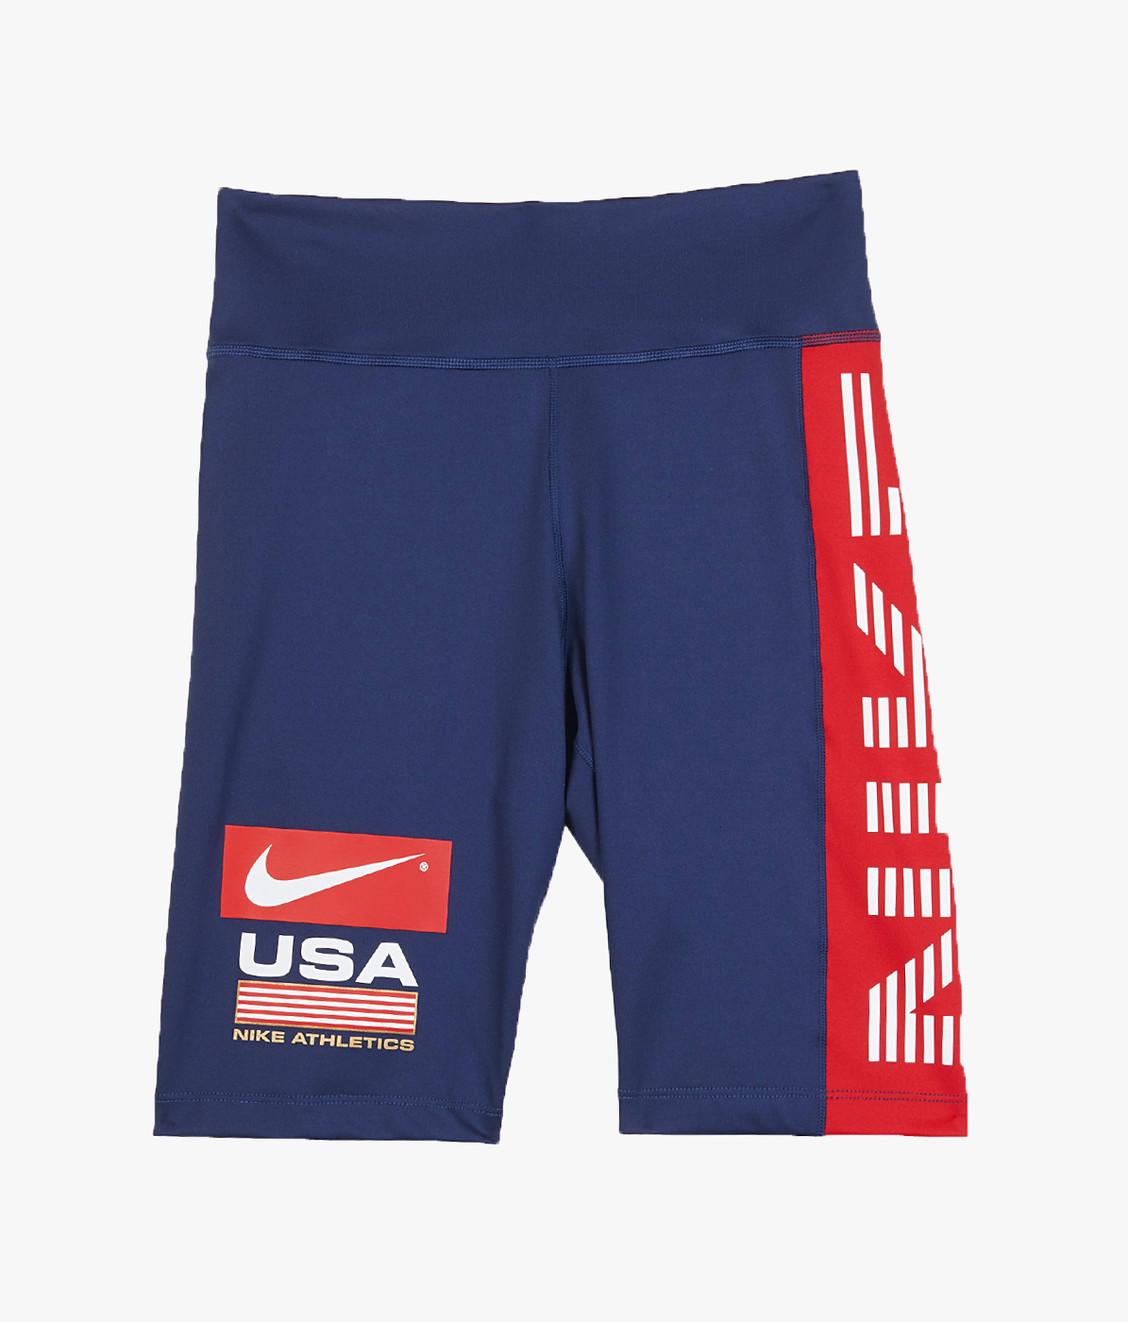 Nike W Nike NRG Bike Shorts Navy USA